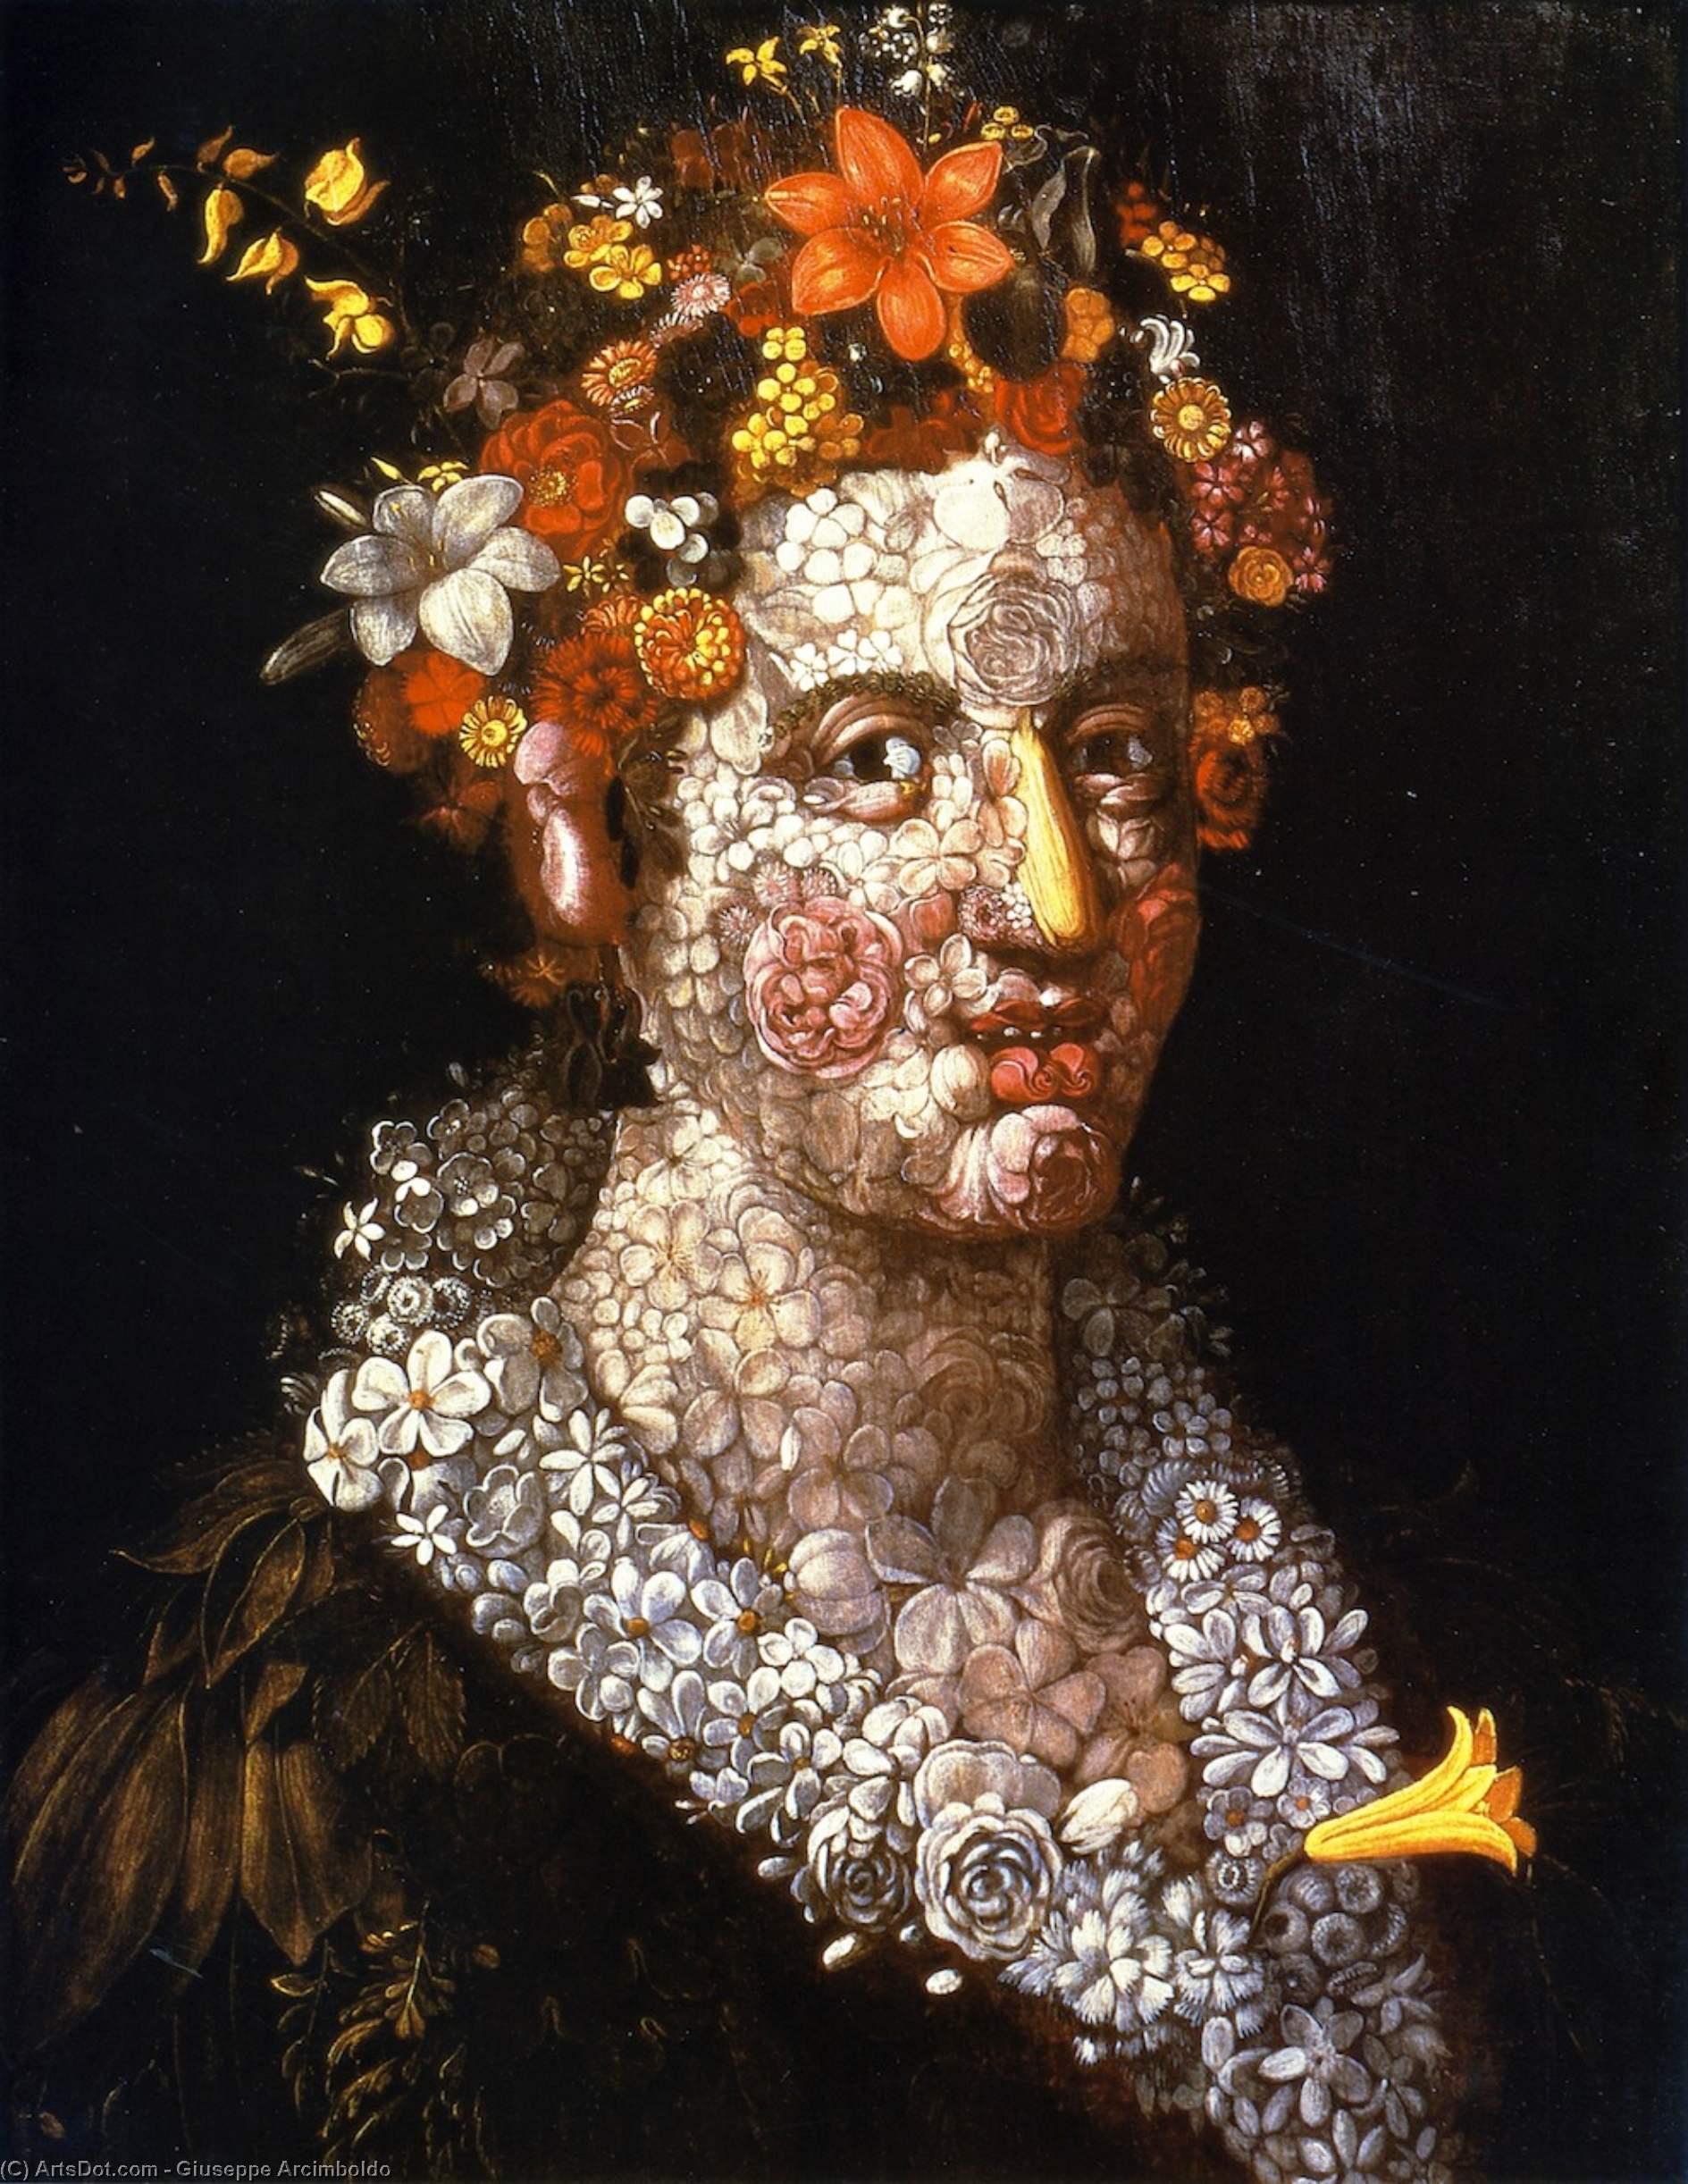 Floral Still LIfe - Giuseppe Arcimboldo